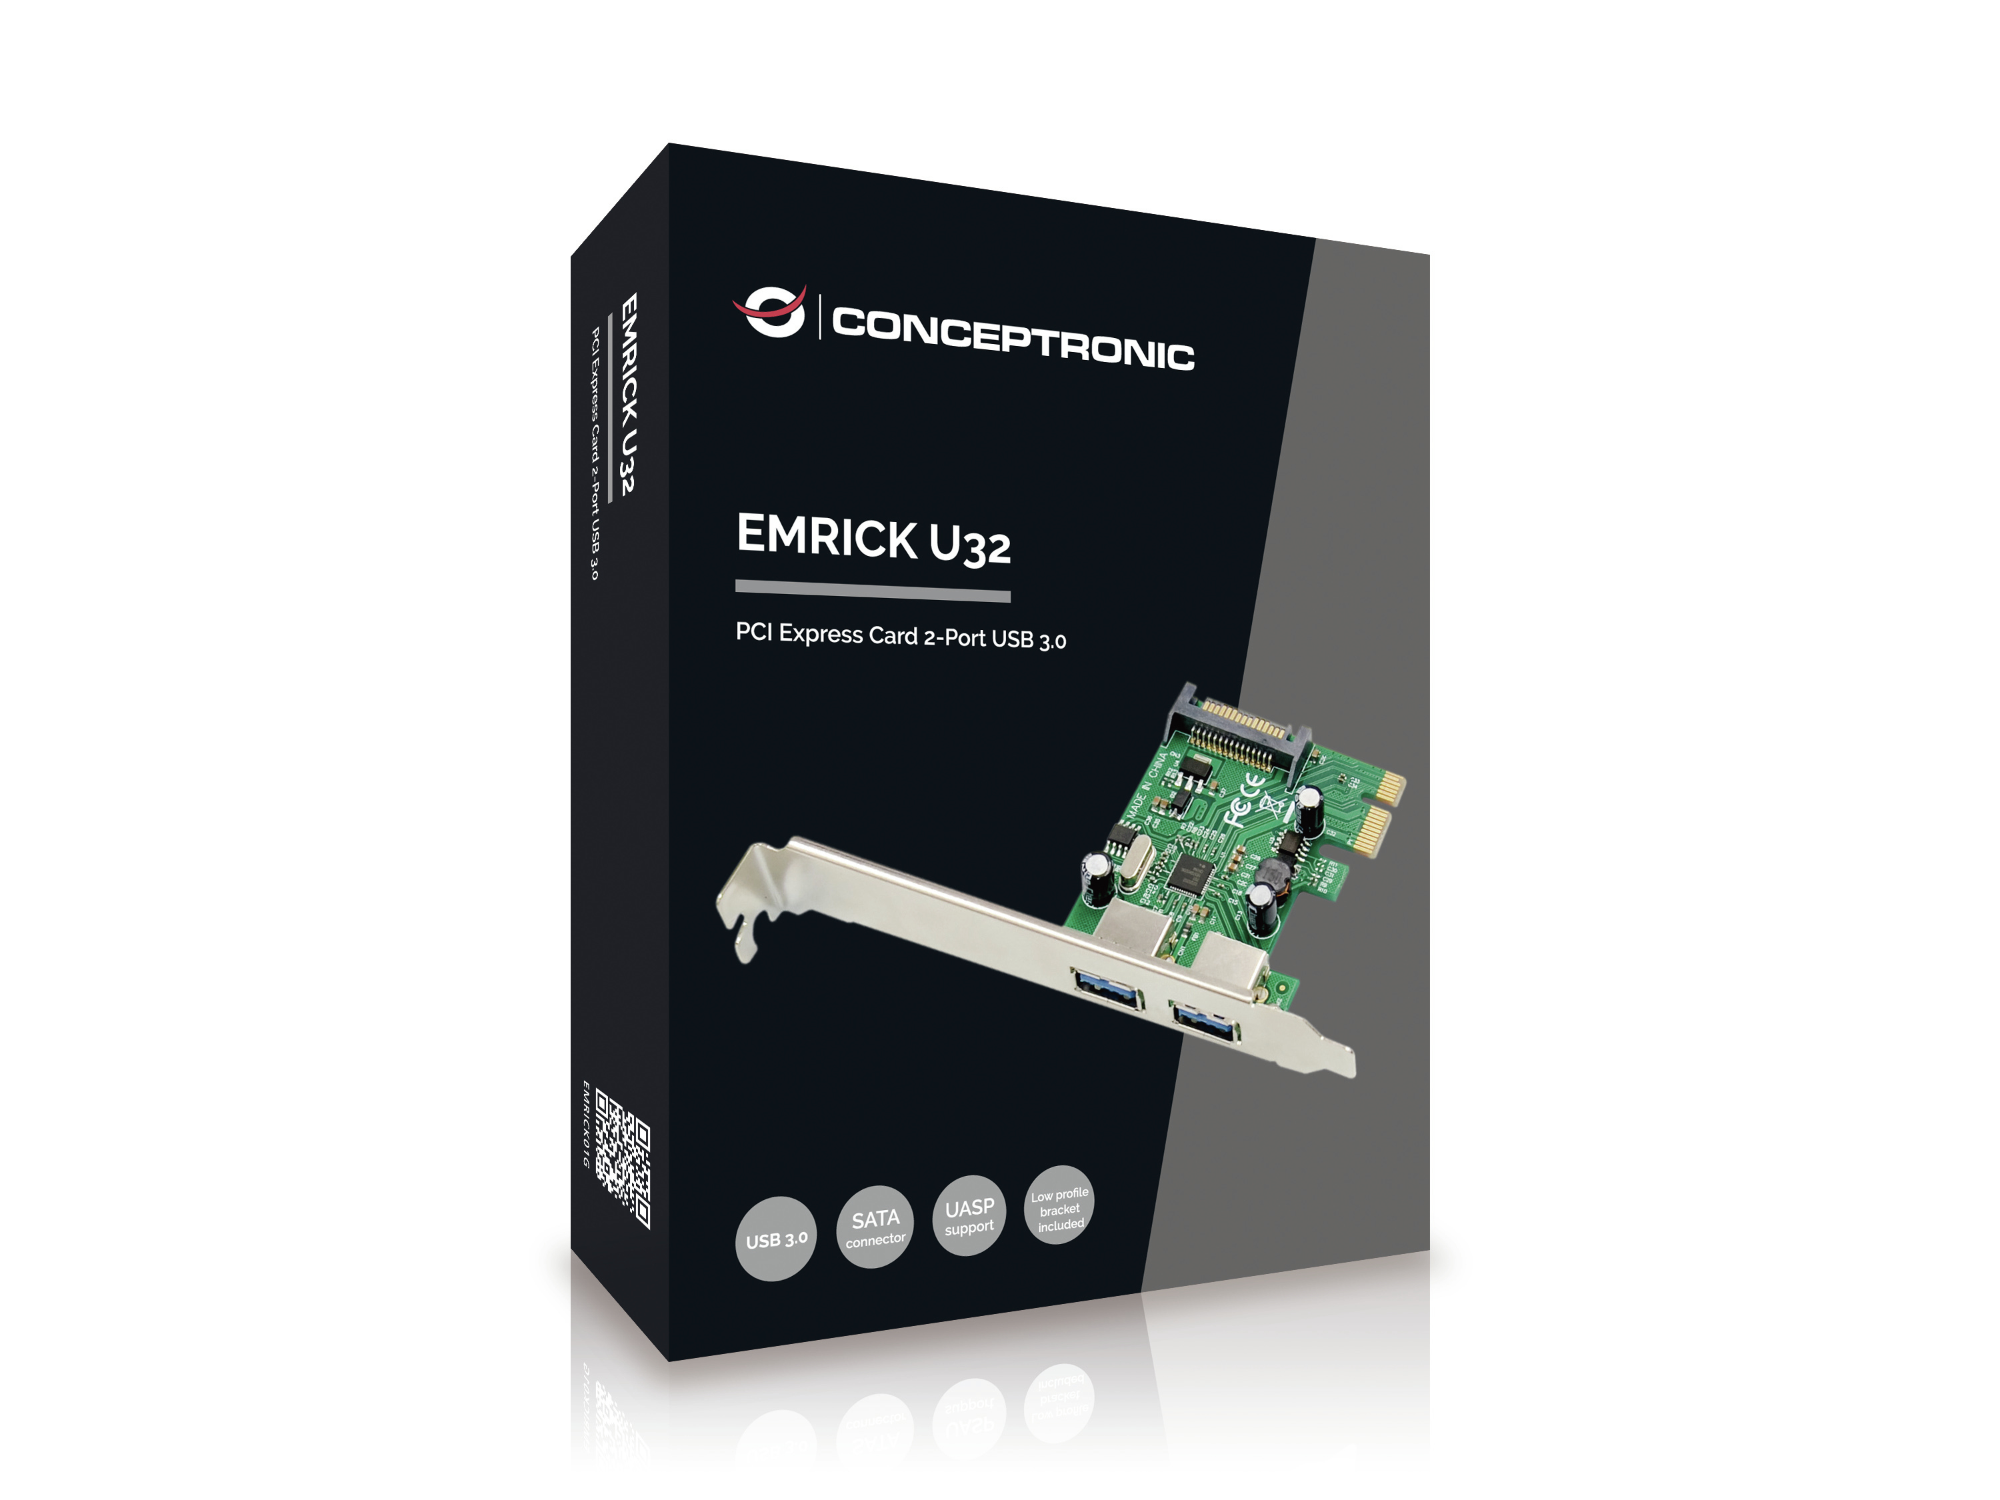 EMRICK01G TARJETA Y ADAPTADOR DE INTERFAZ USB 3.2 GEN 1 (3.1 GEN 1) INTERNO